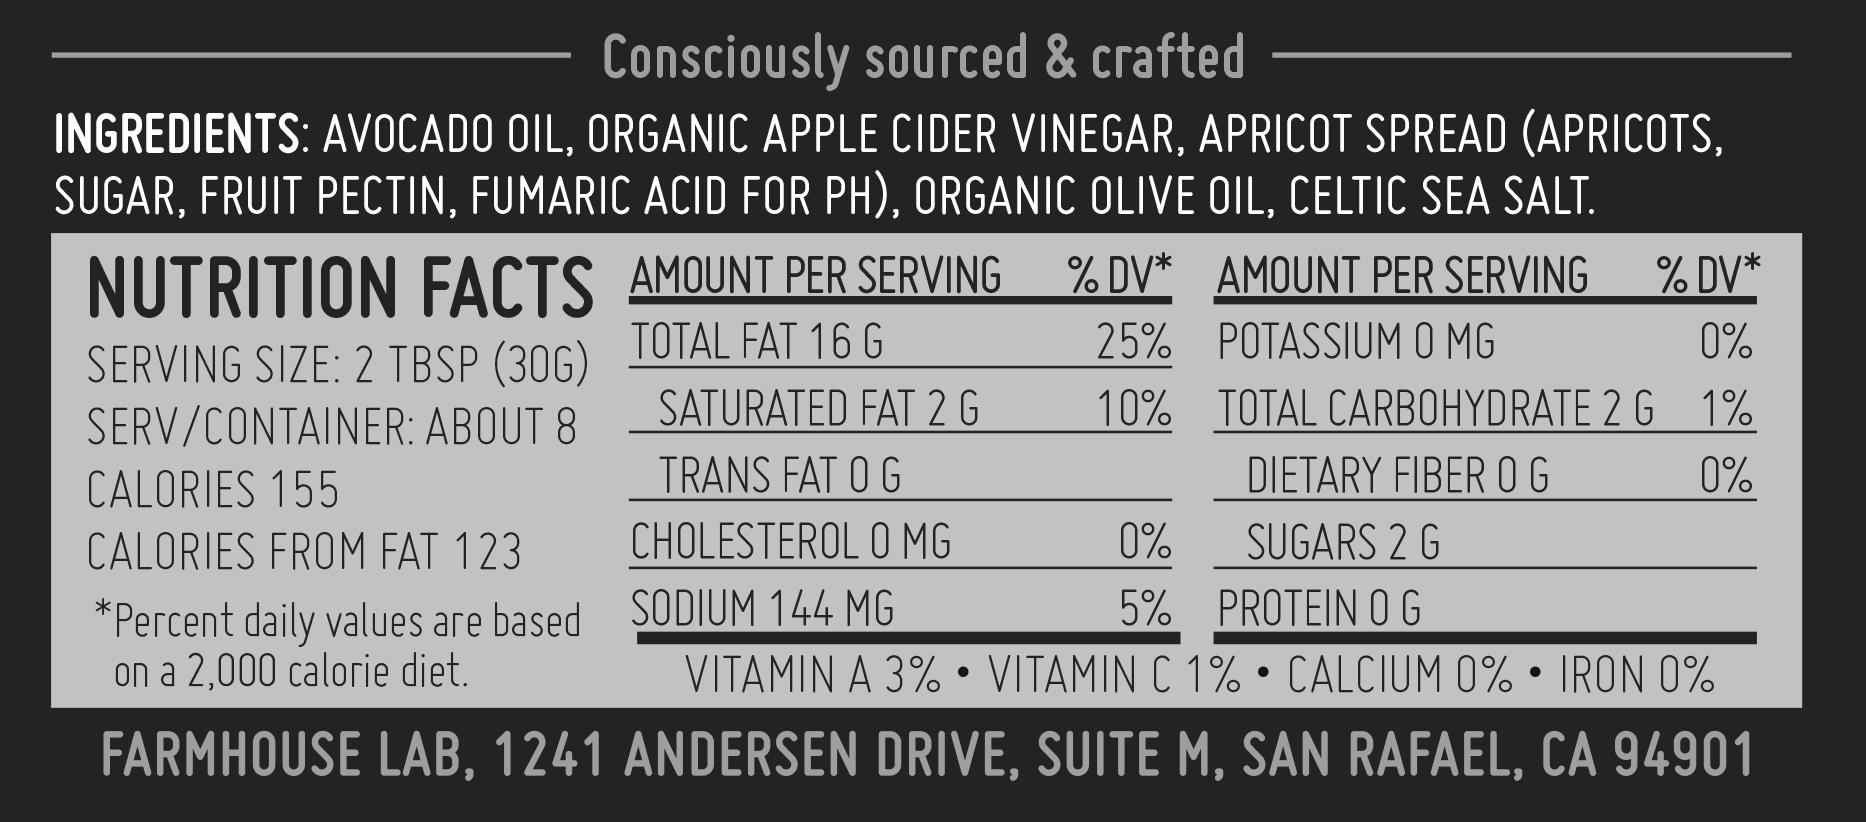 SunnyAvocado_NutritionFacts.jpg